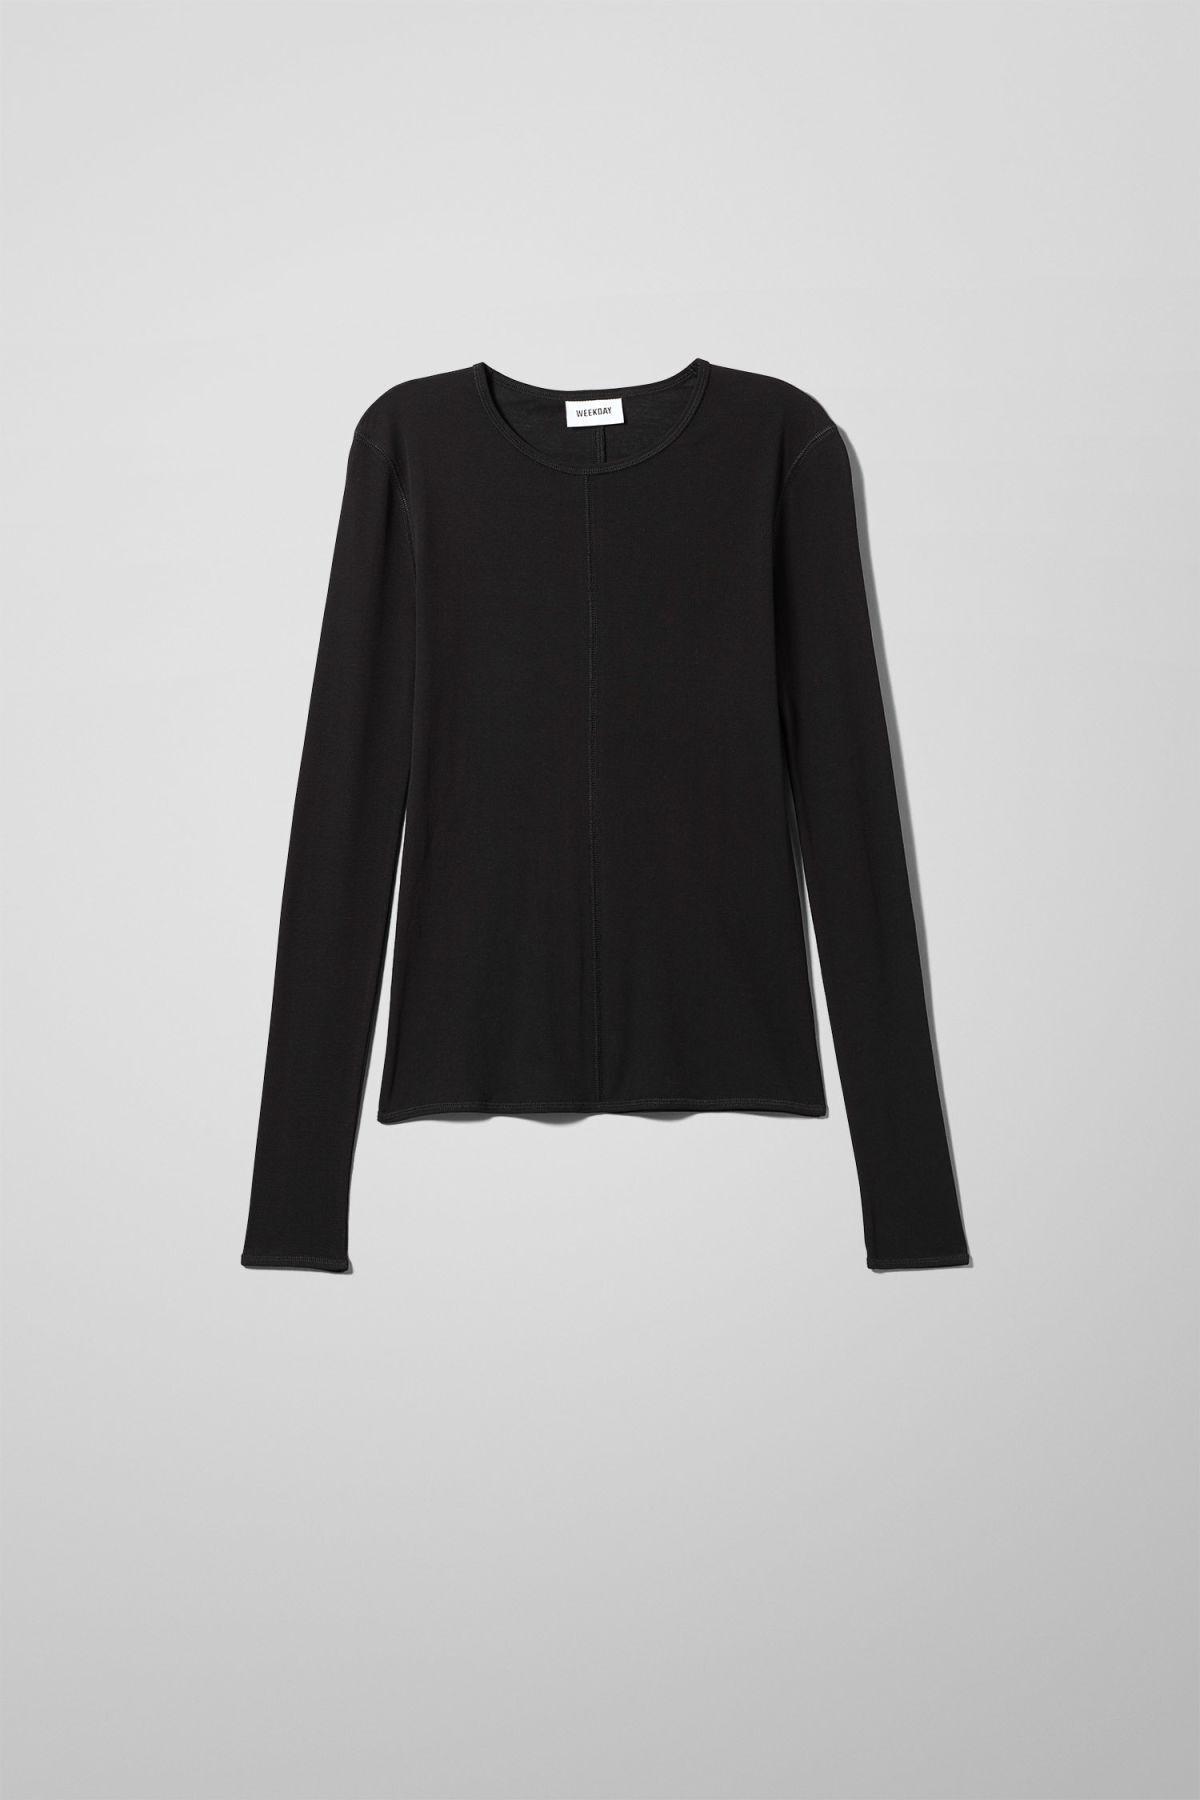 Image of Transparent Long Sleeve - Black-XS